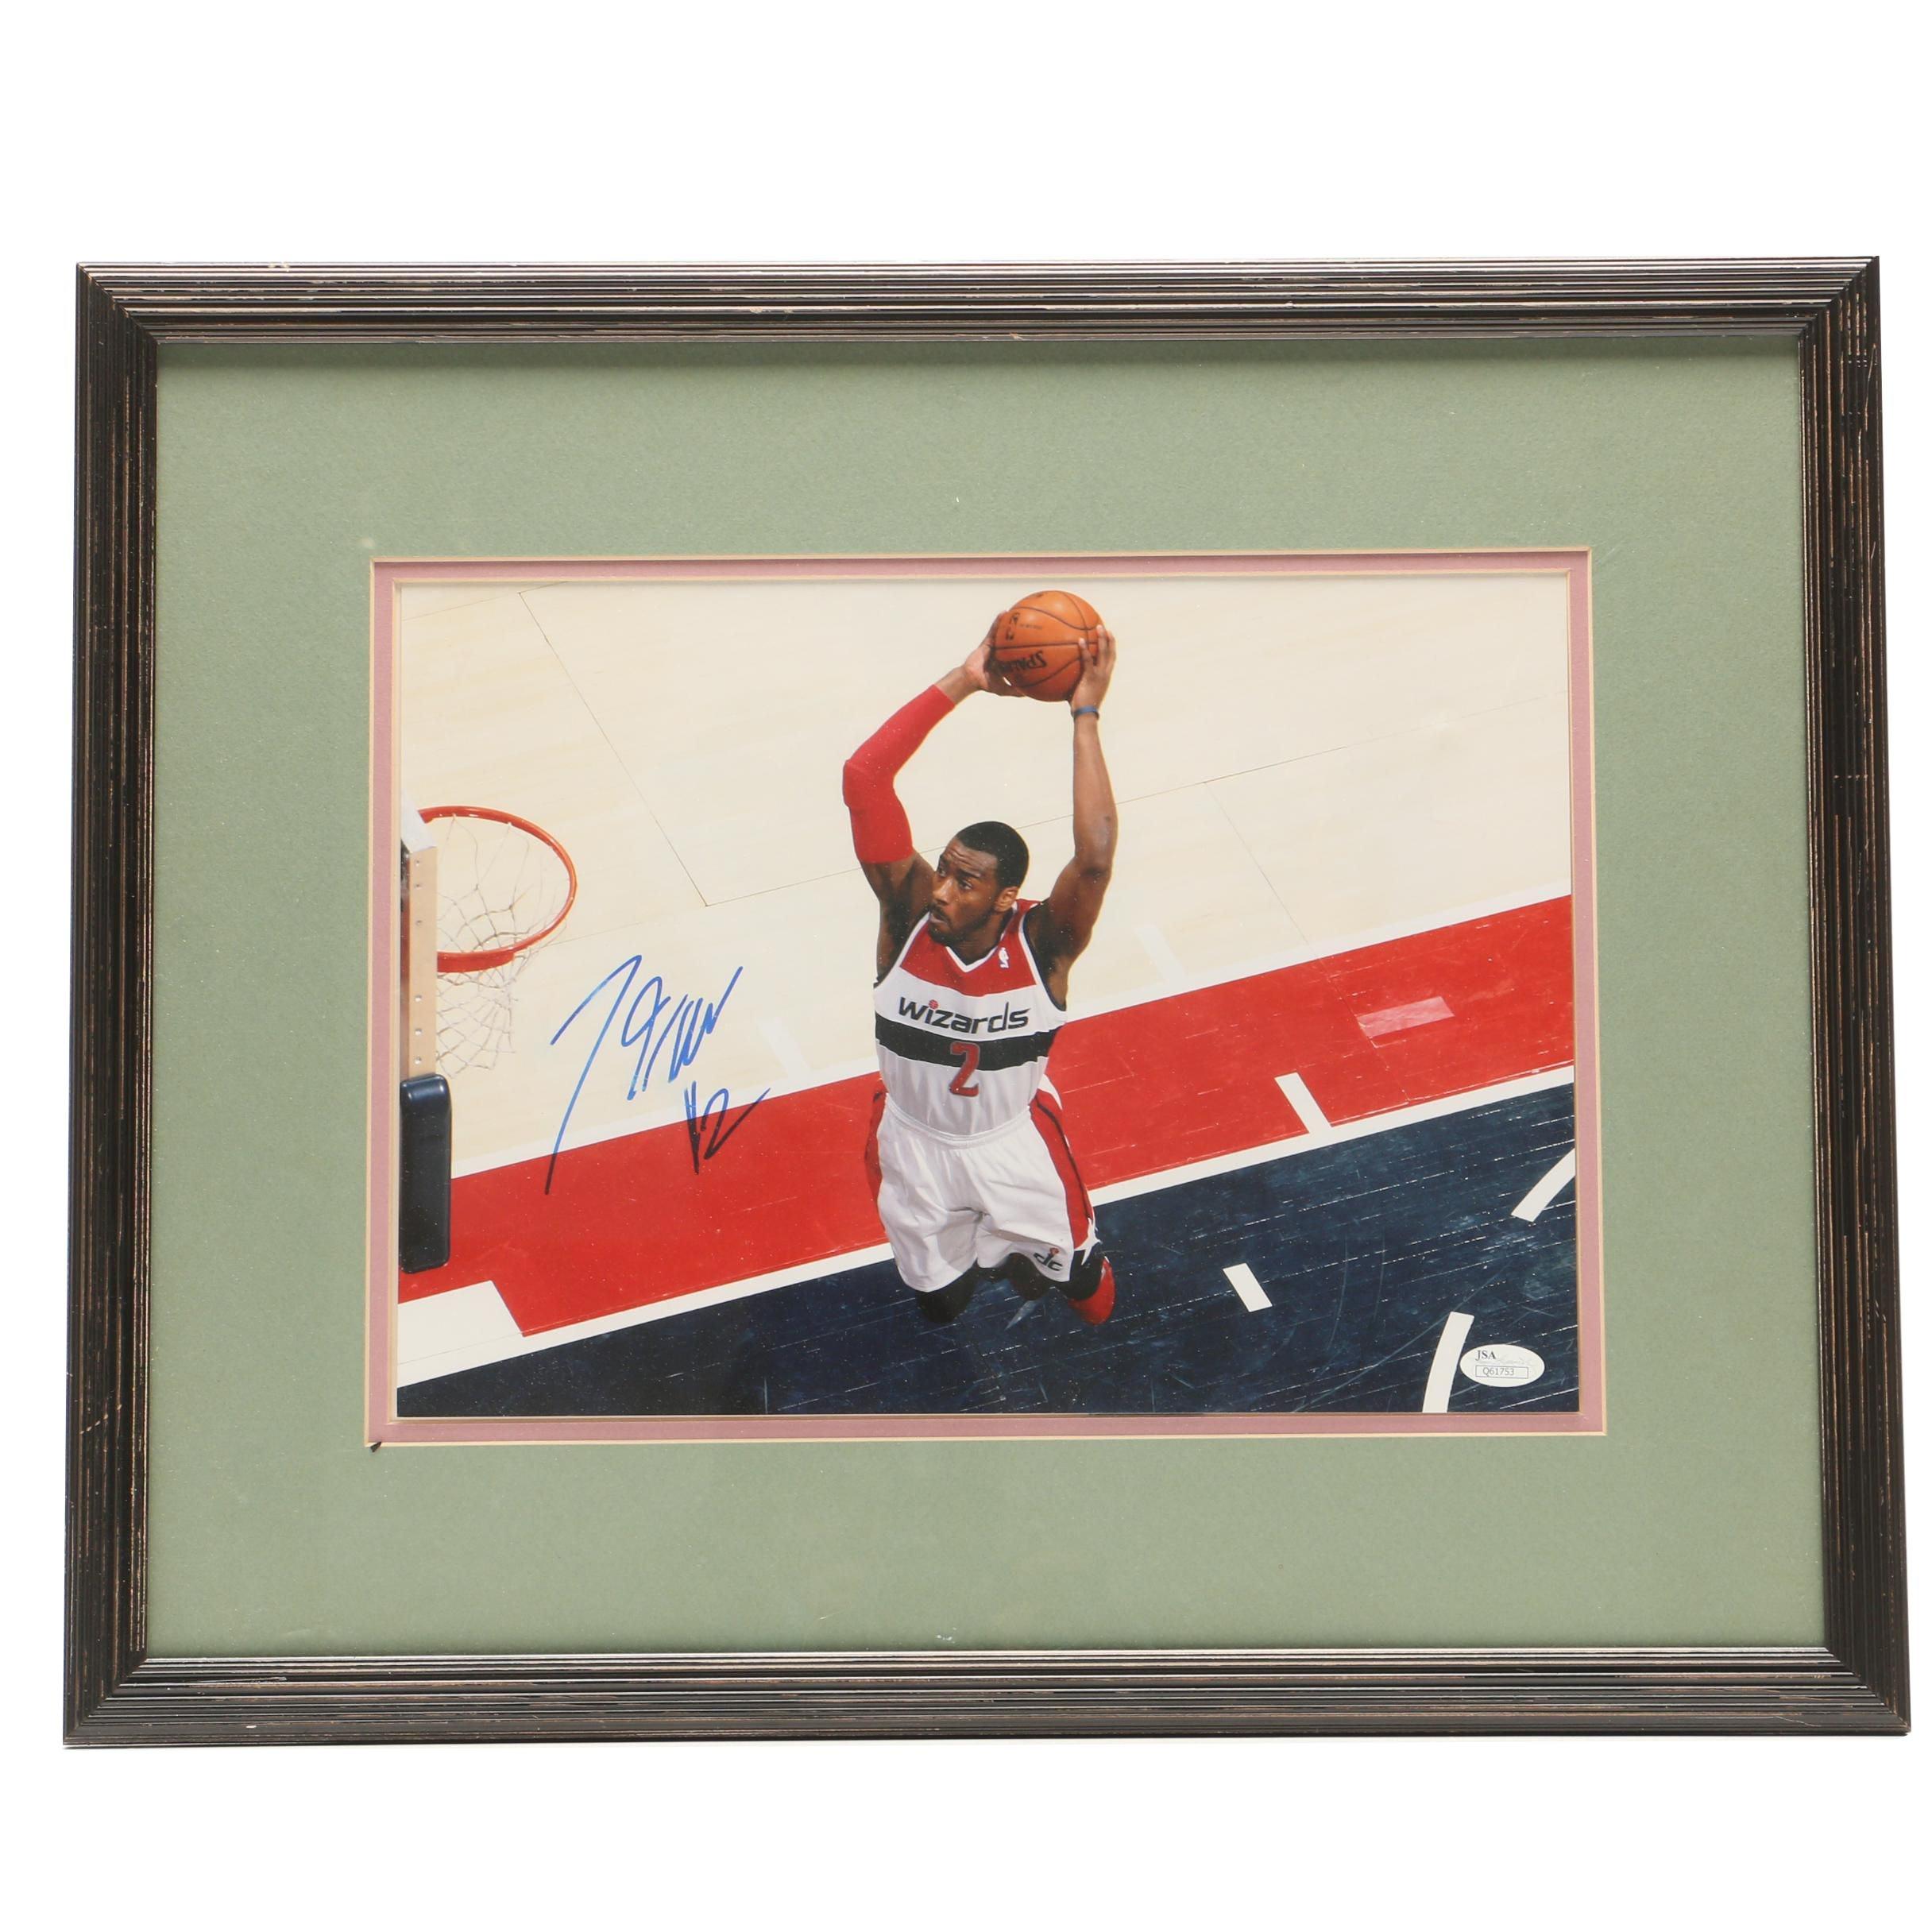 John Wall Signed Washington Wizards Framed and Matted Photo Display JSA COA